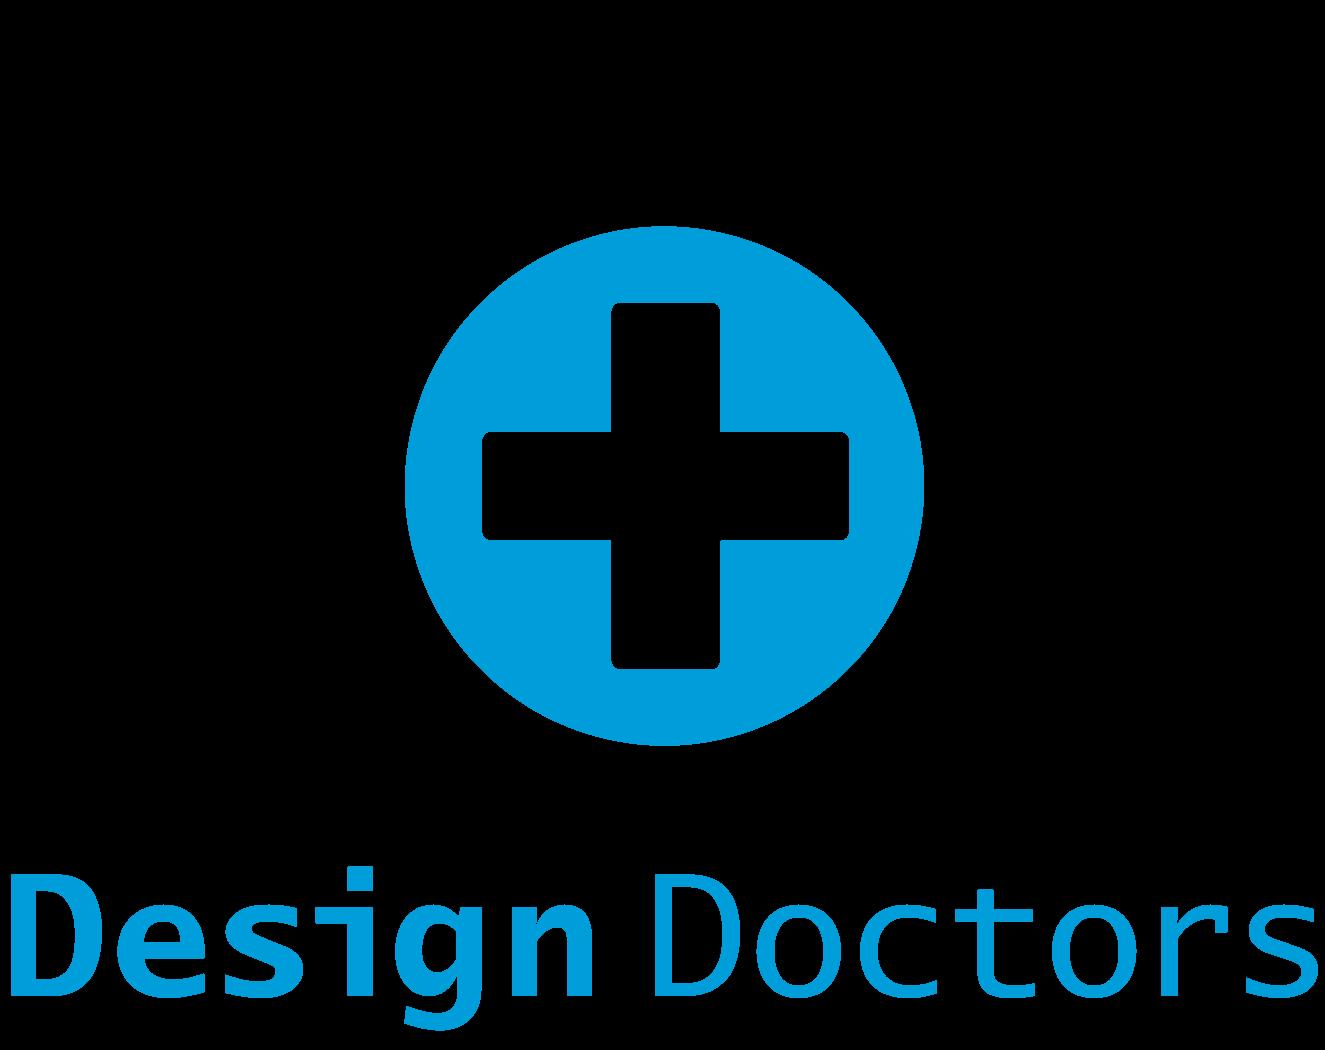 Design Doctors – Grafik, Werbung & Webdesign Hilden